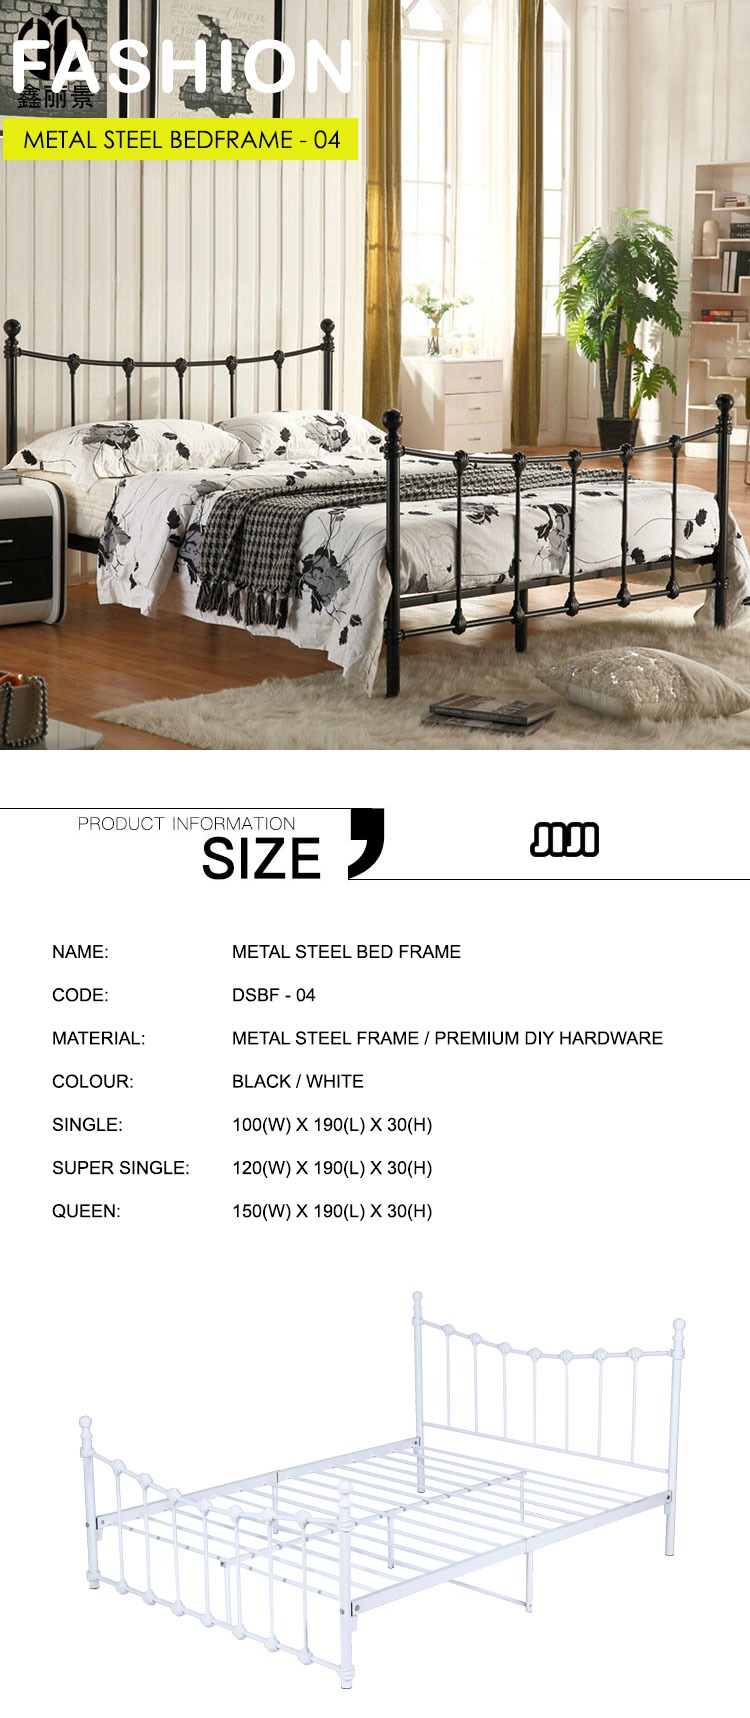 Metal Steel Bed Frame (DSBF-04)